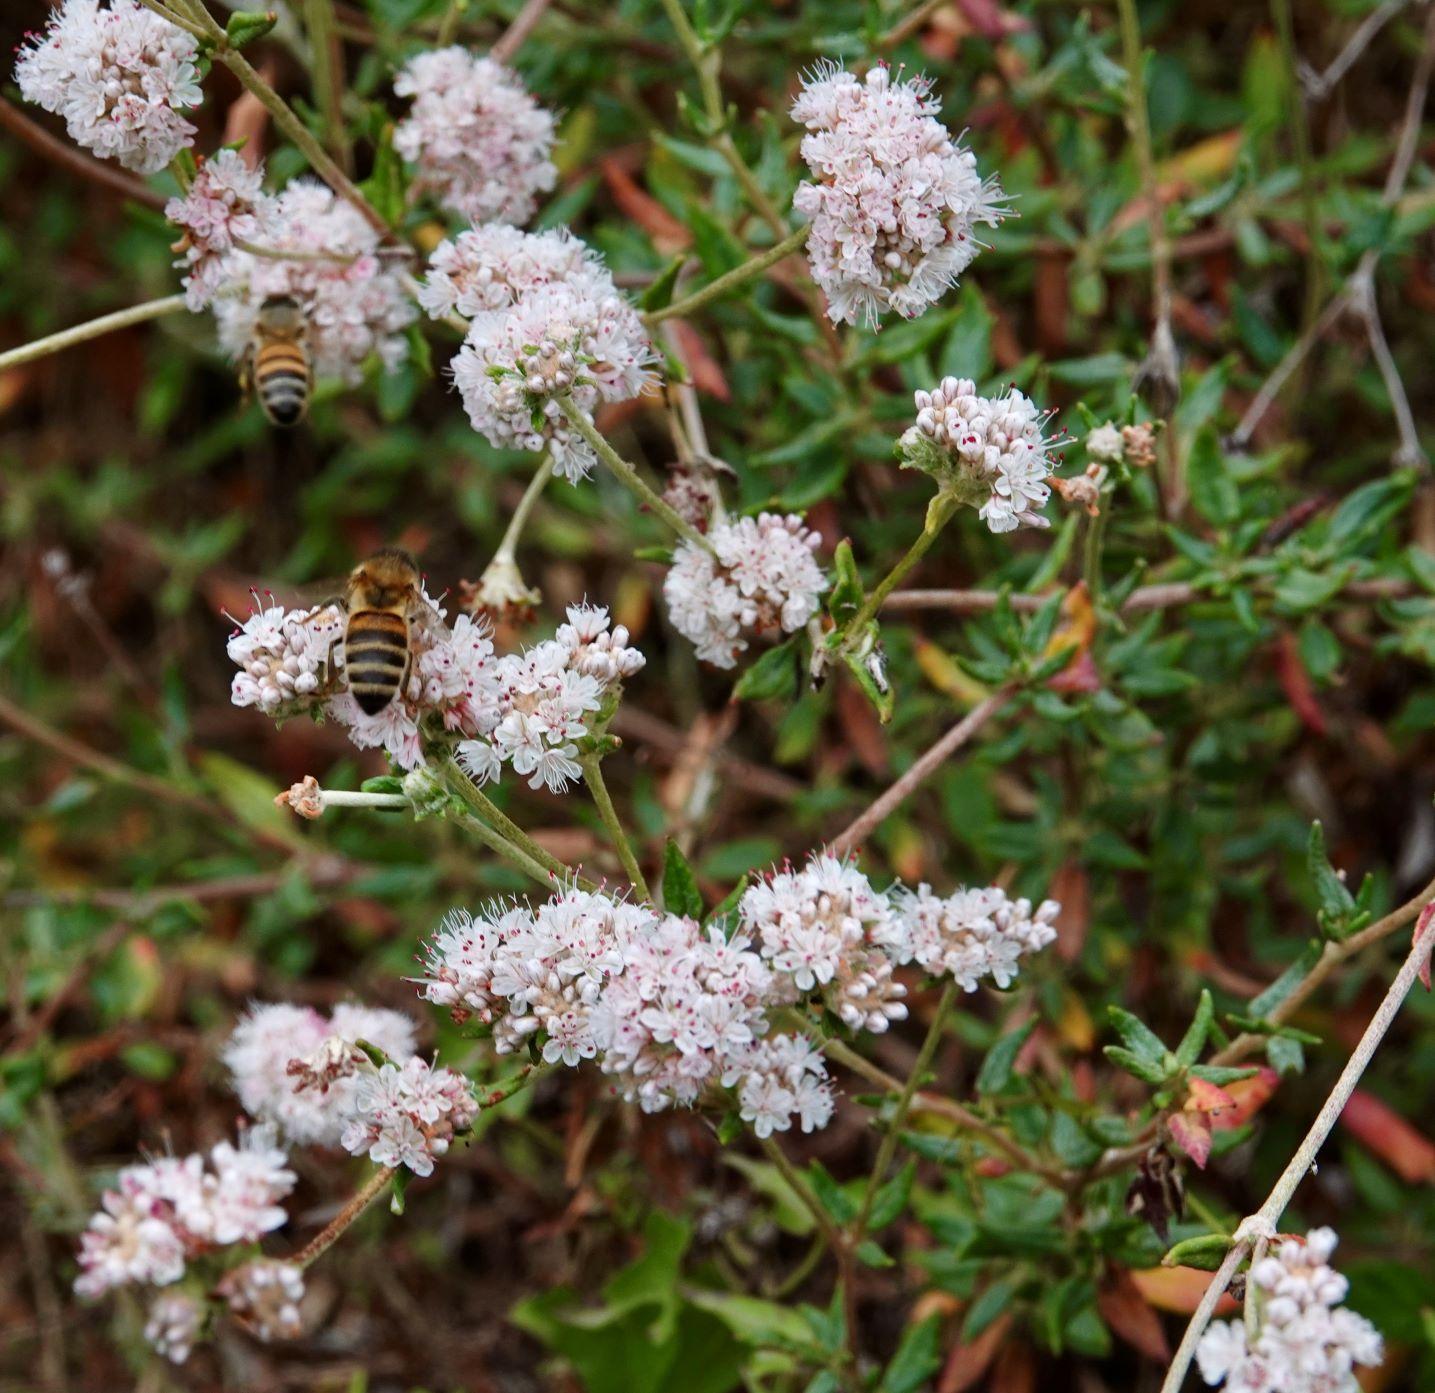 Buckwheat, Seacliff Wild